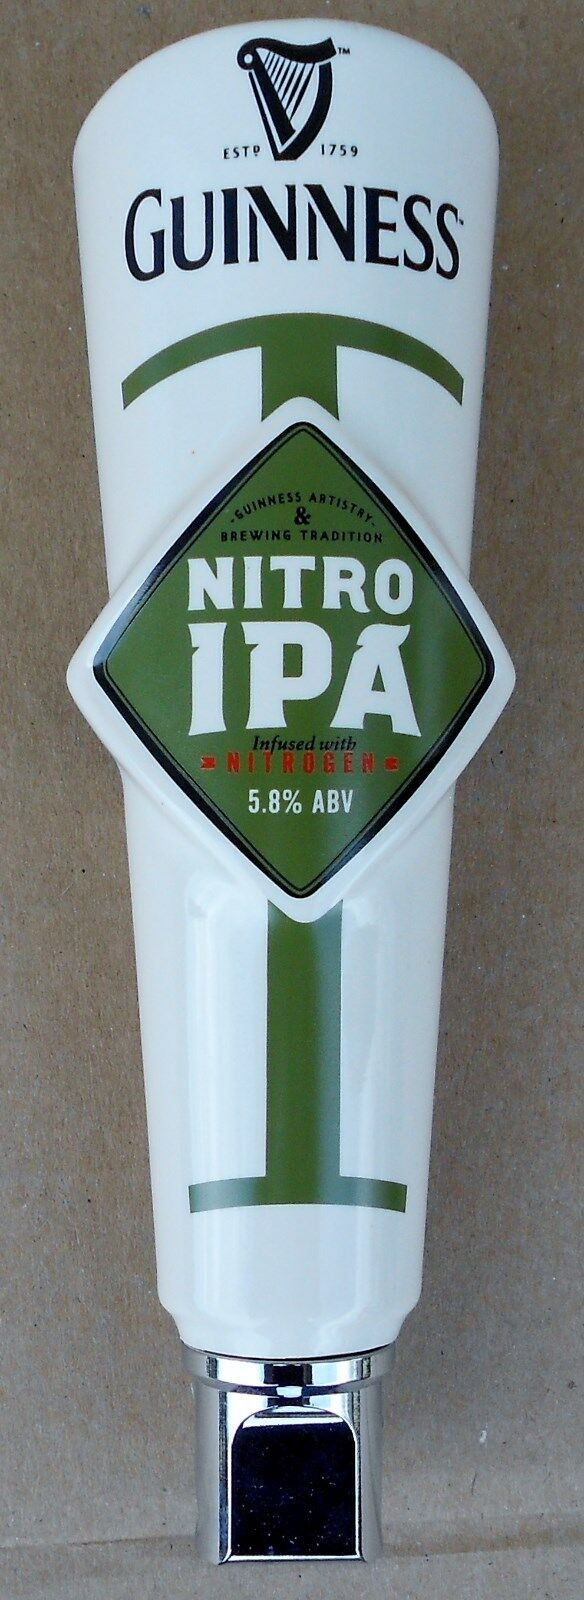 GUINNESS NITRO IPA SMALL SHOTGUN CERAMIC BEER TAP HANDLE NEW IN BOX 7.5 INCH